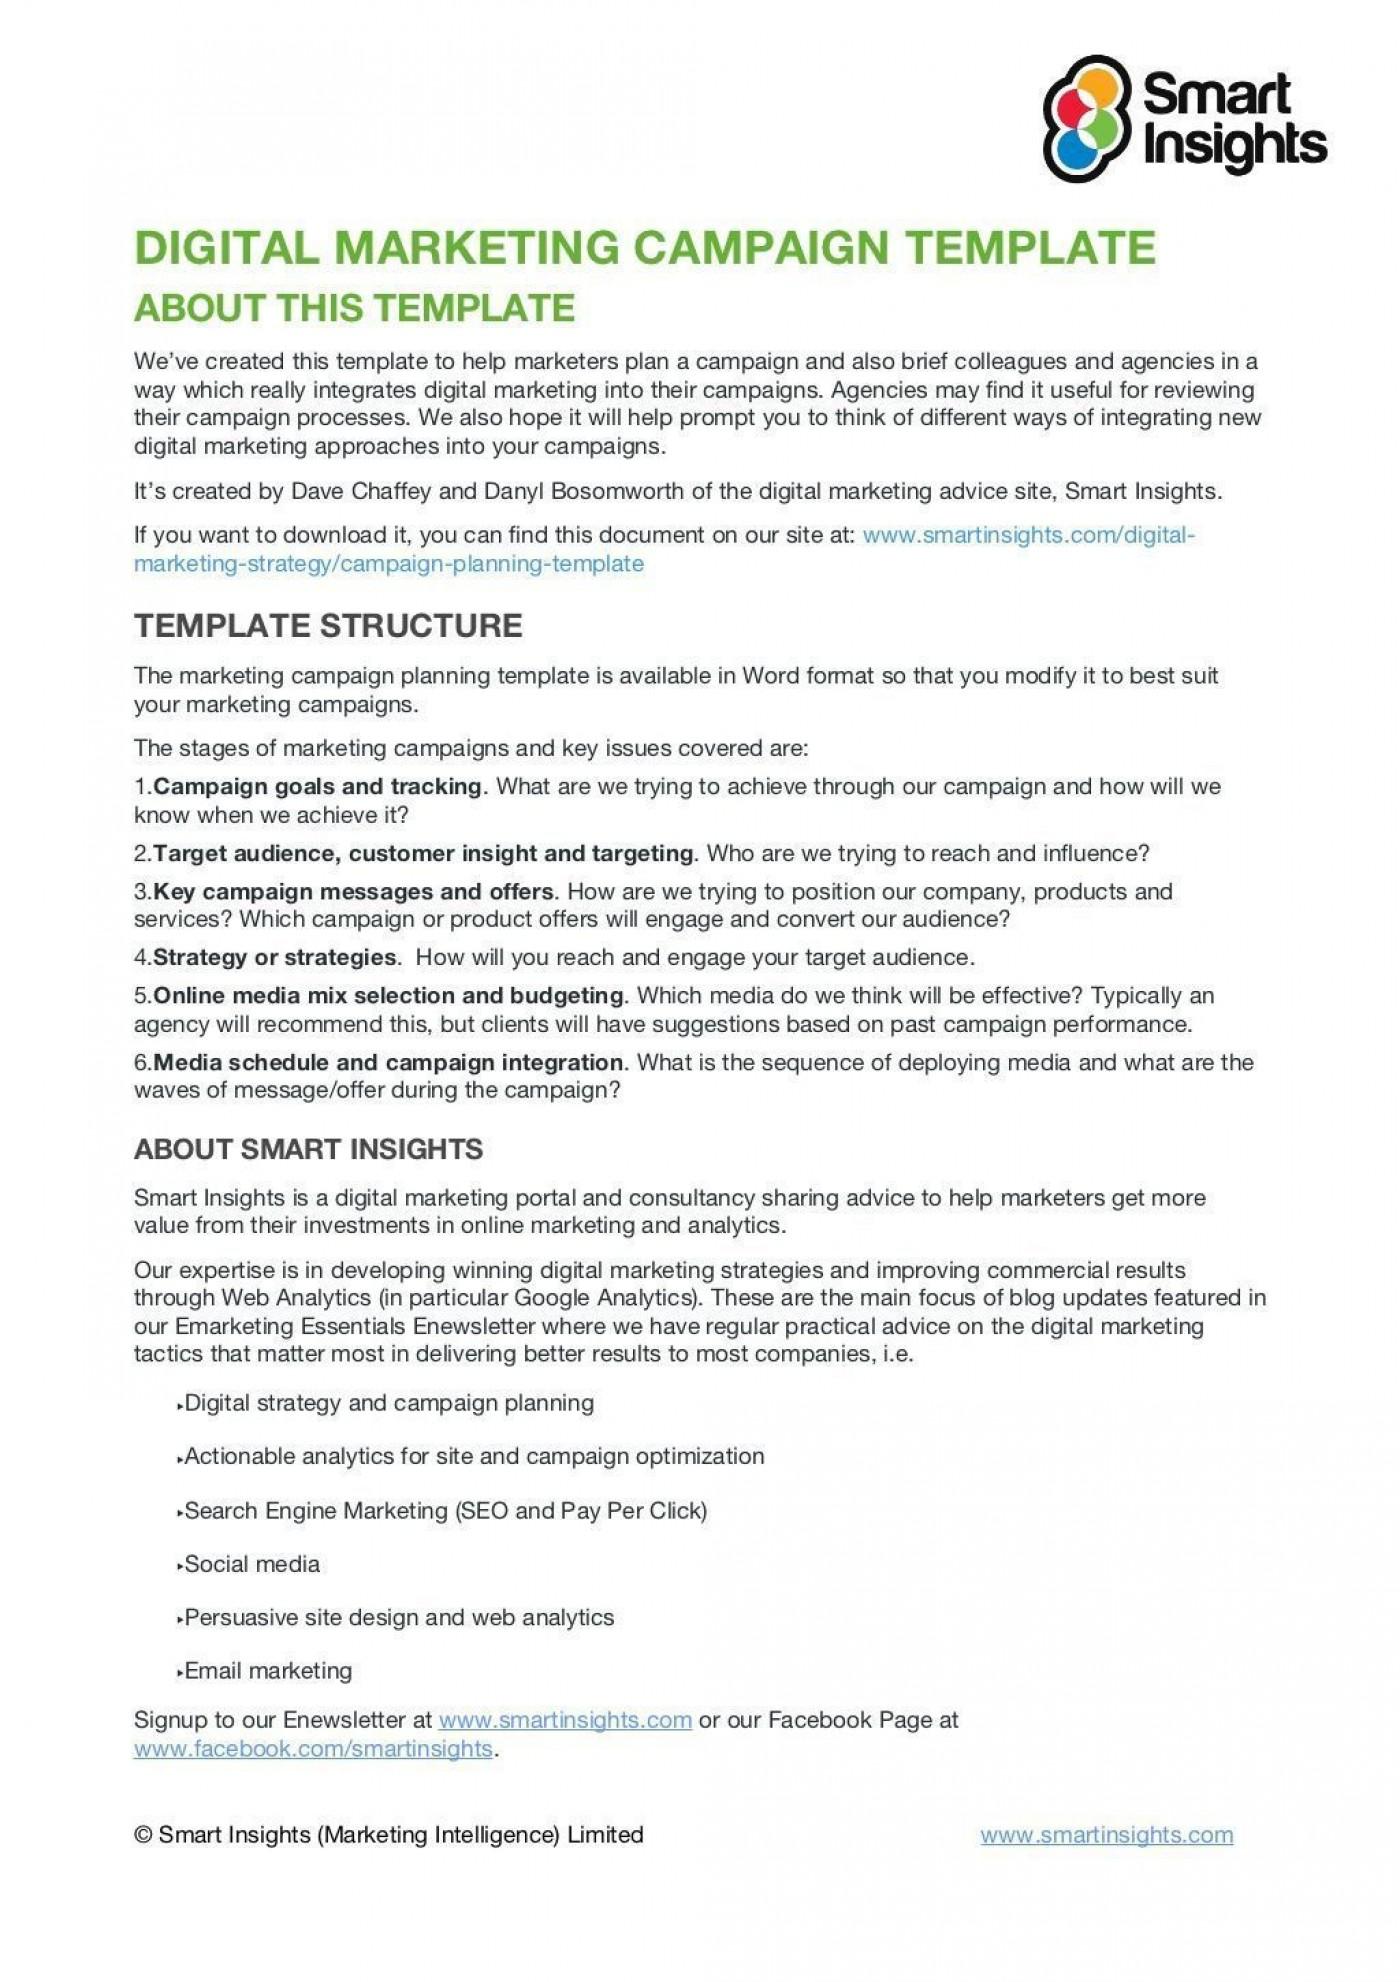 008 Impressive Social Media Marketing Plan Template Doc Image 1400